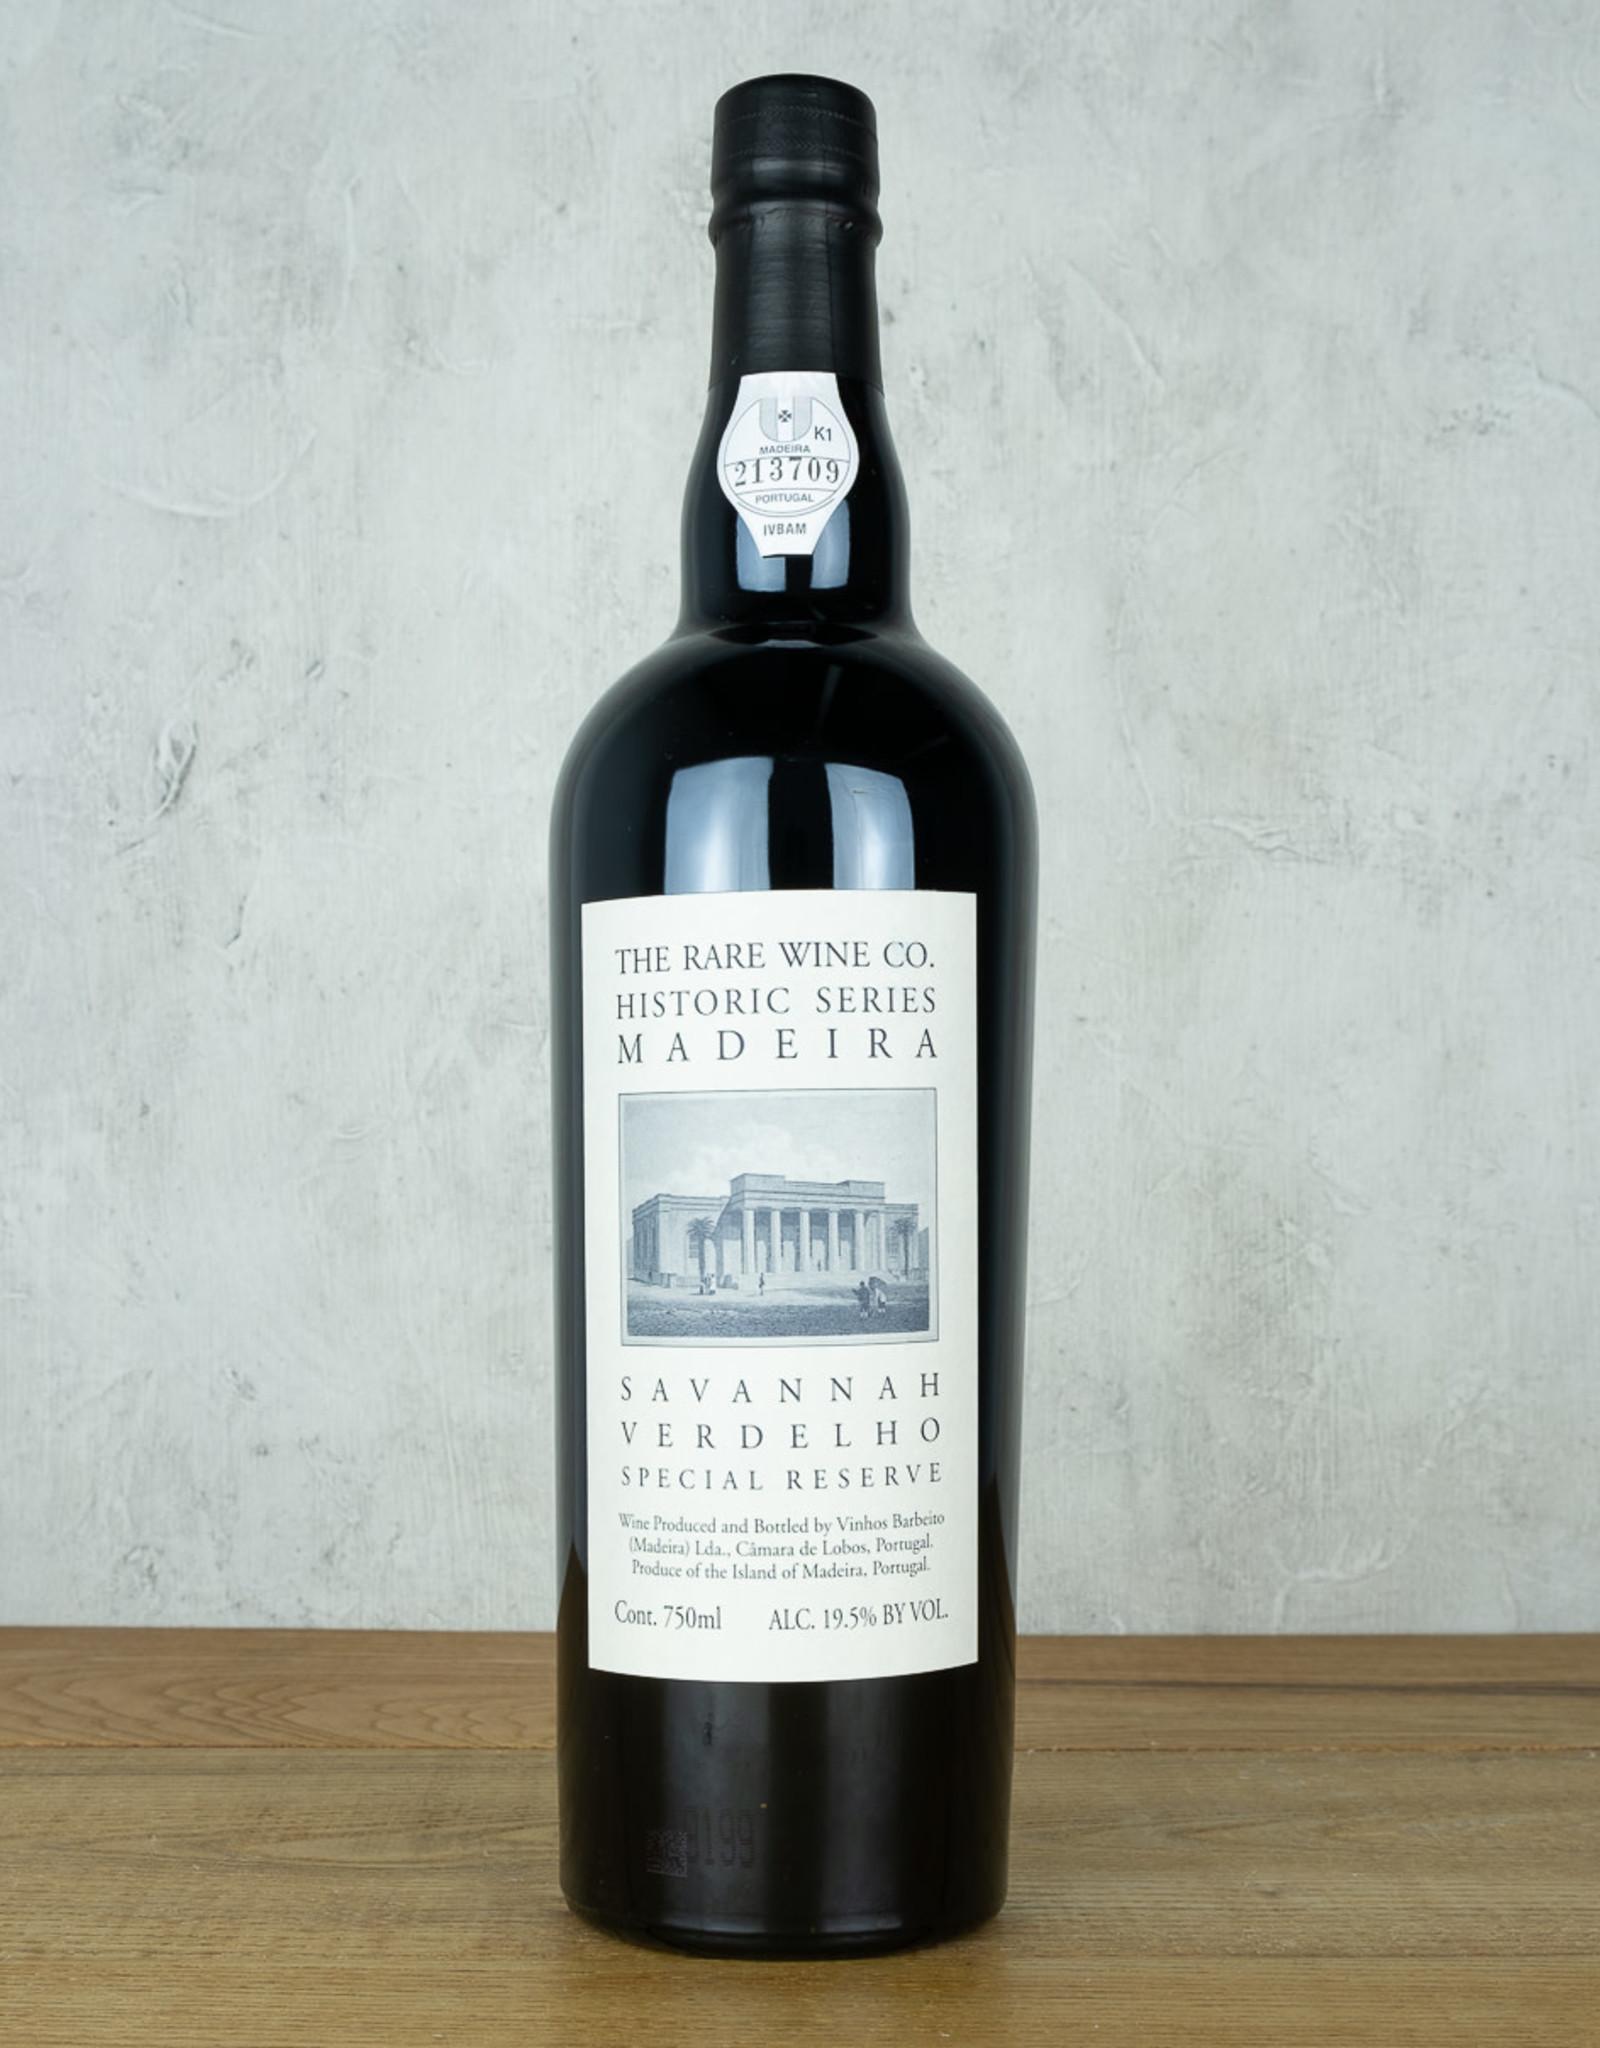 The Rare Wine Co. Historic Series Savannah Verdelho